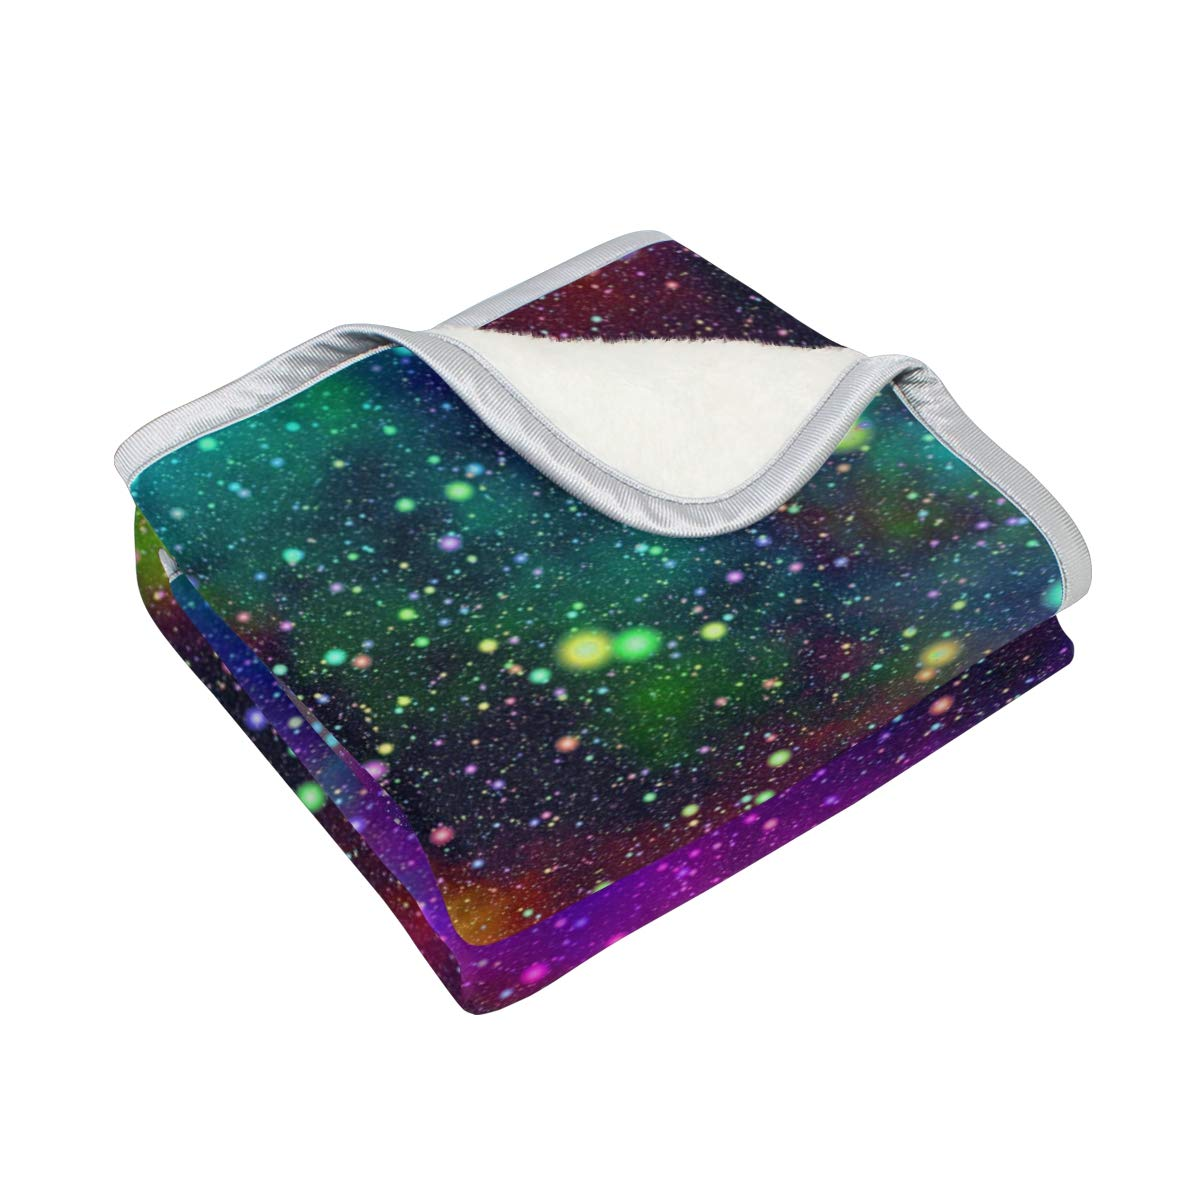 7a5de6496791 Amazon.com: XLING Home Throw Blanket Colorful Space Universe Galaxy ...